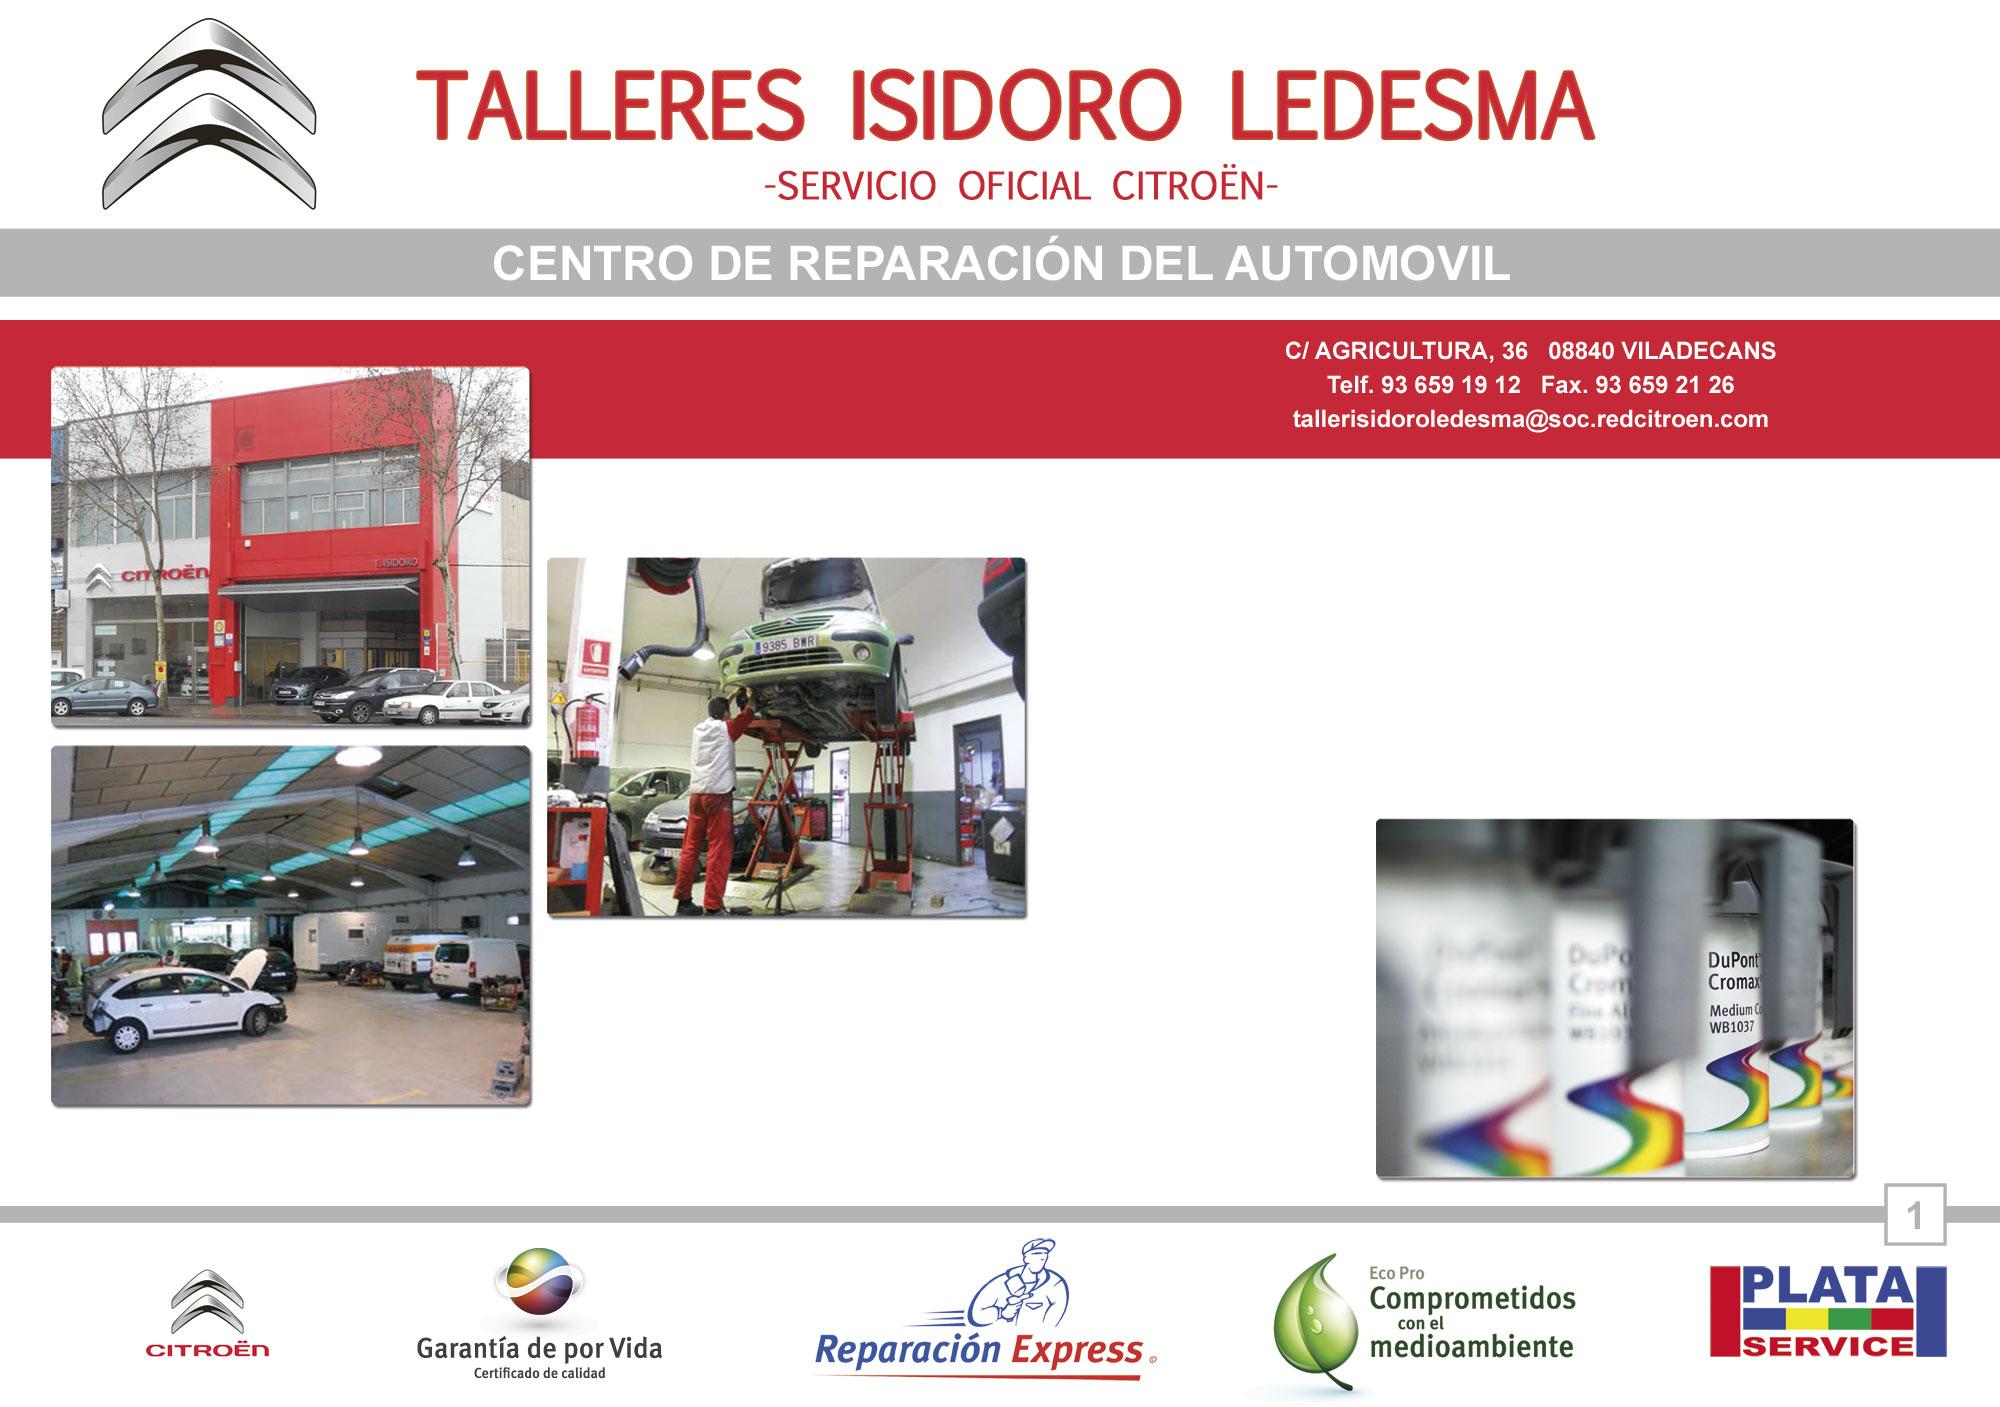 Taller TALLER ISIDORO LEDESMA S.L. (Citroen) en Barcelona